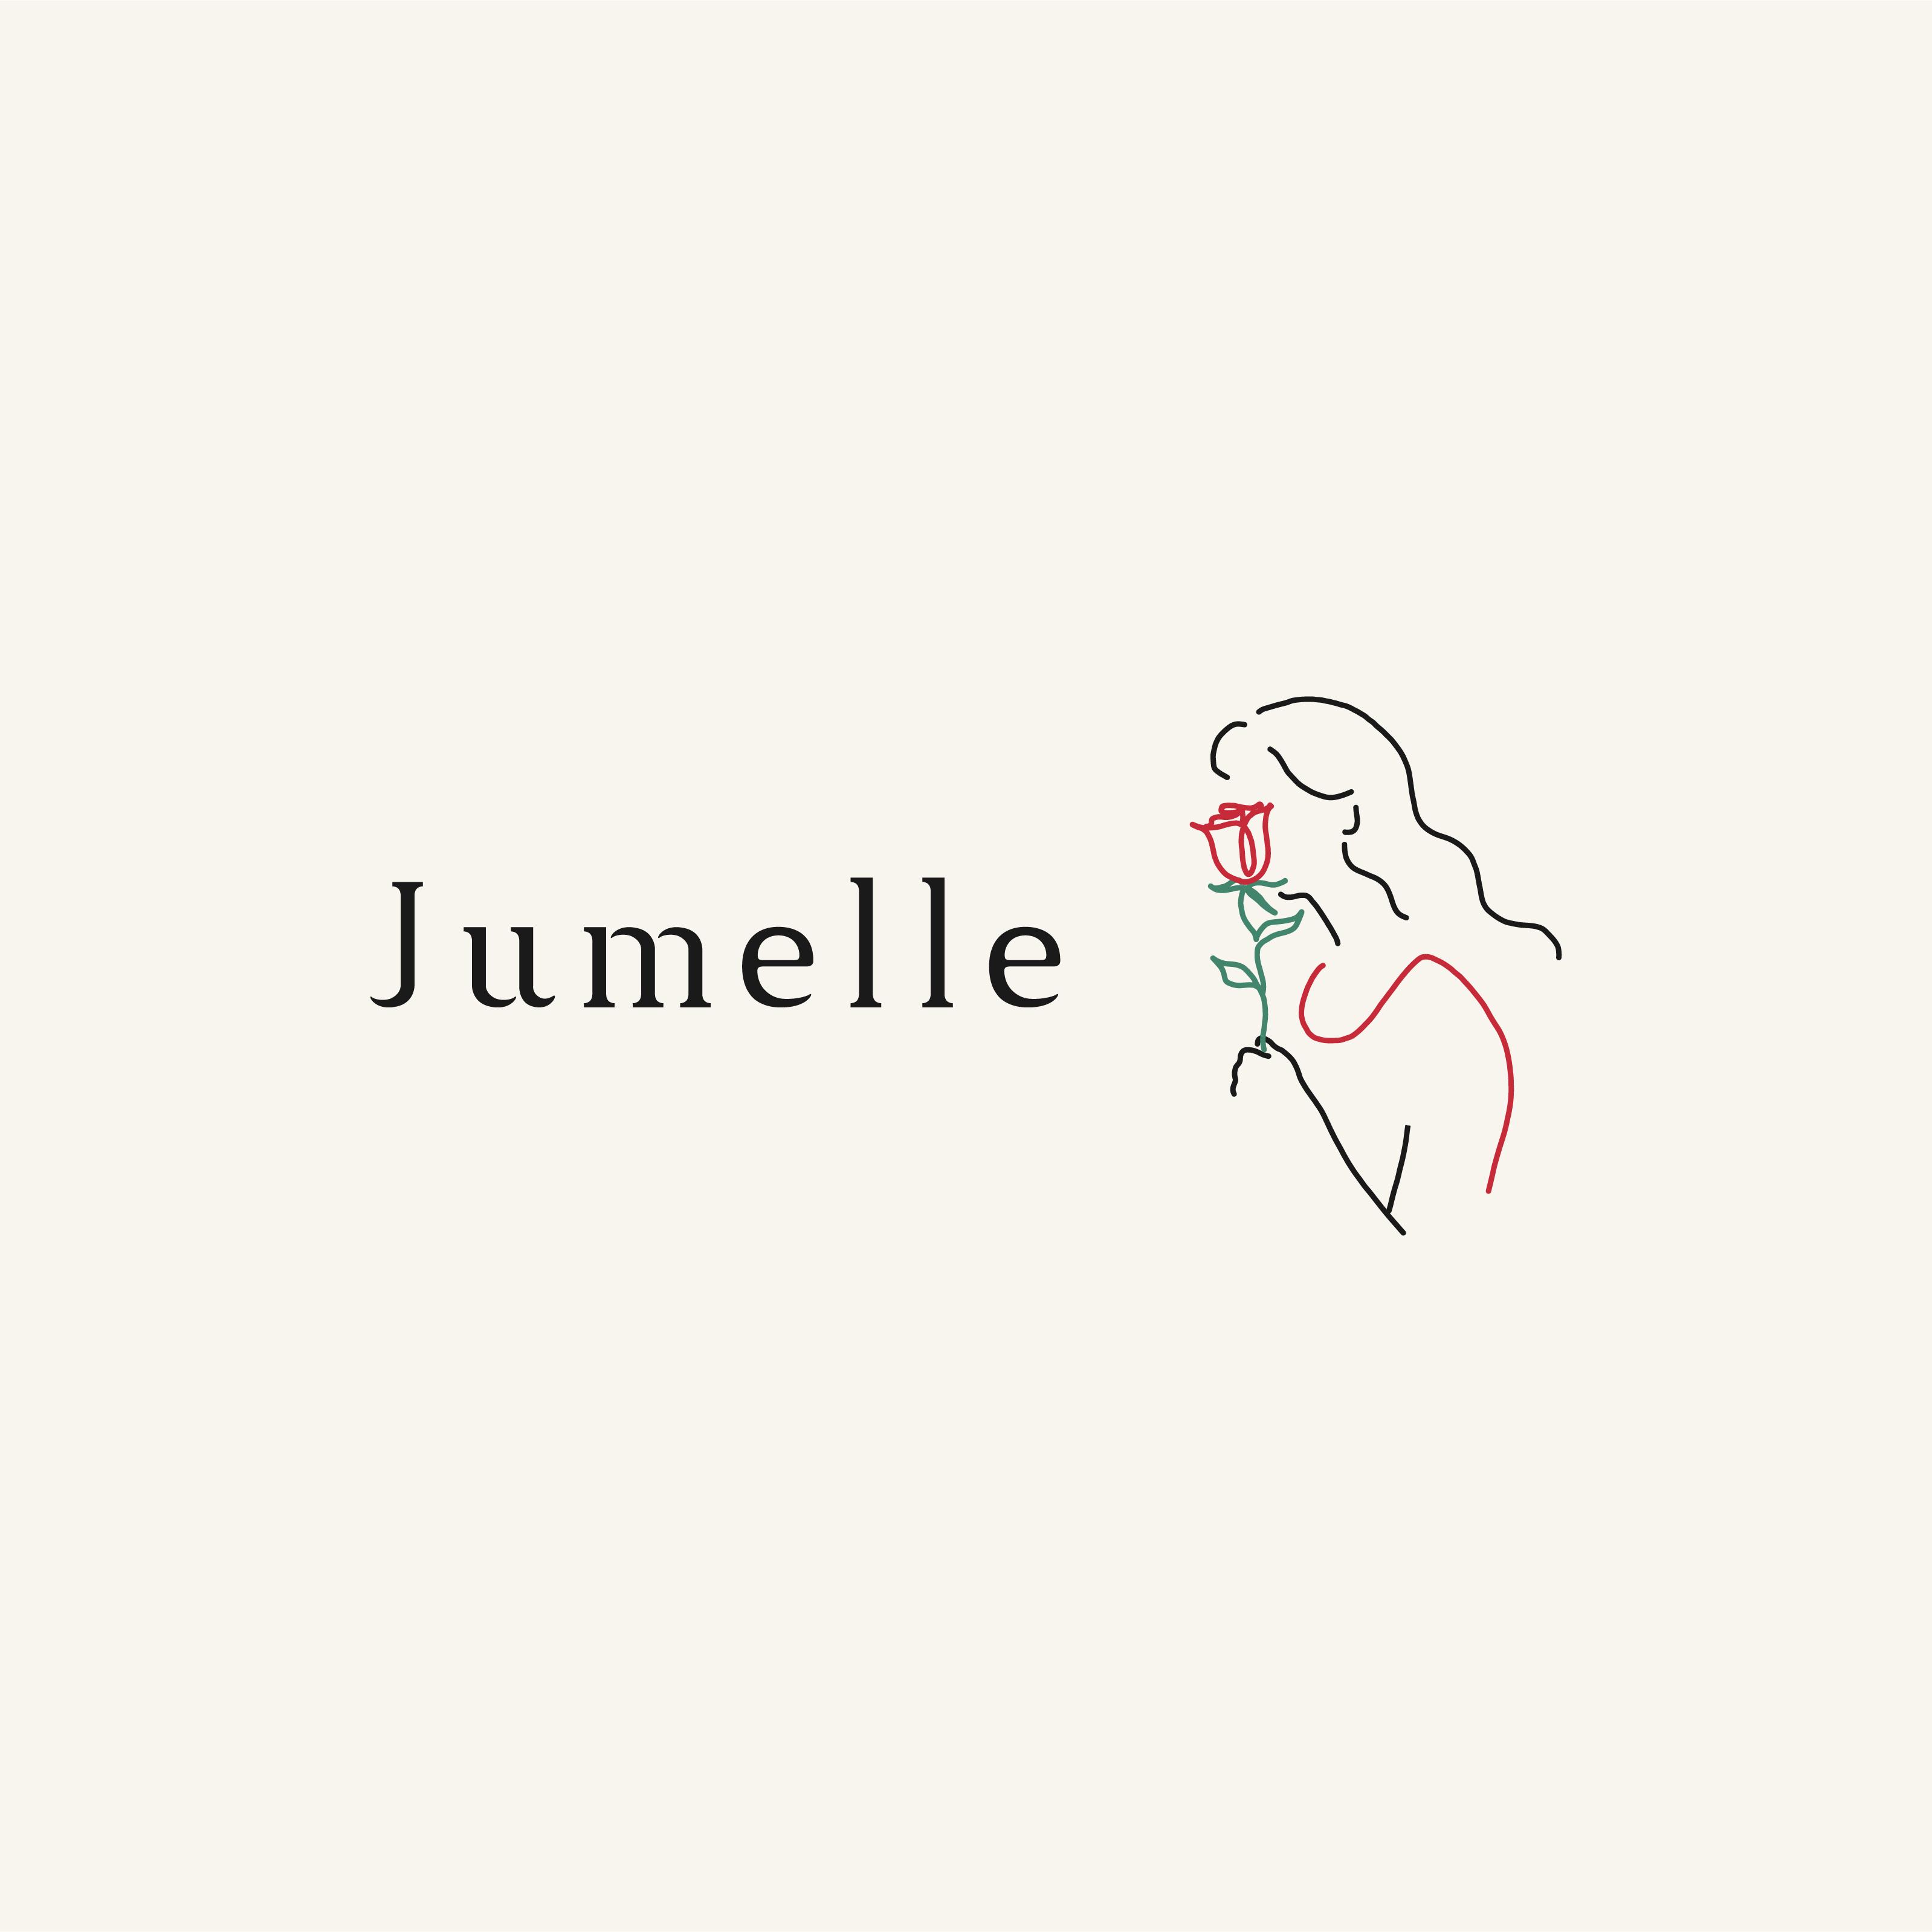 jumelle